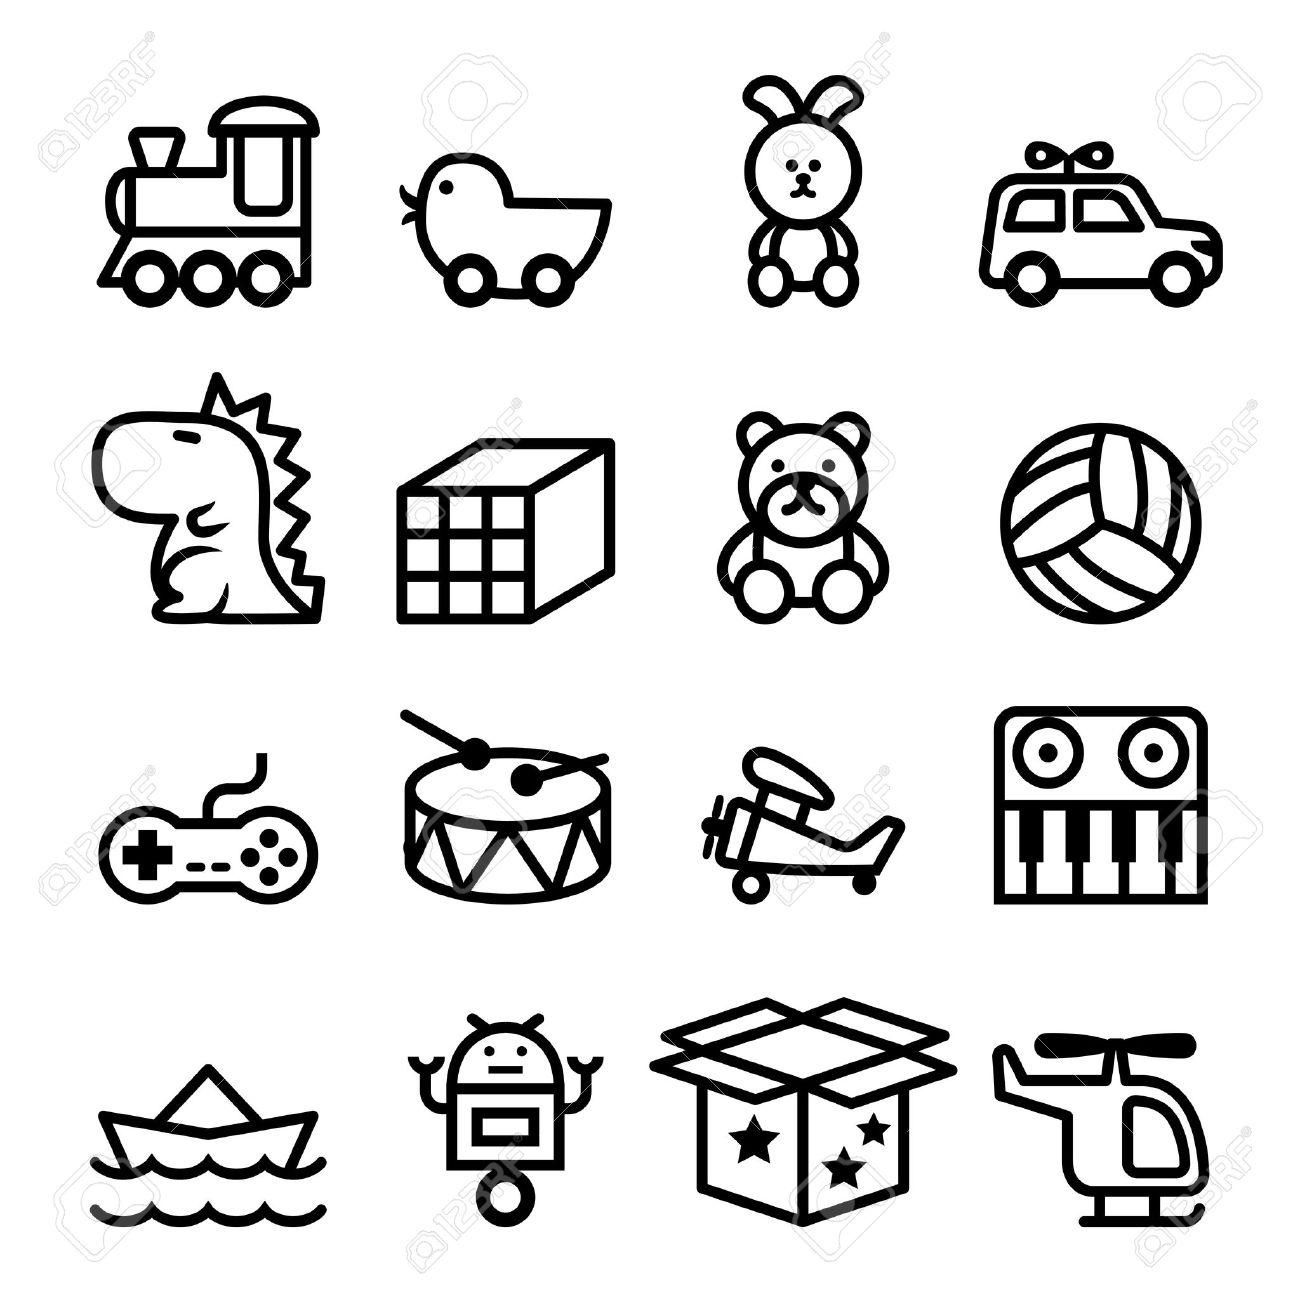 Outline Toy icon set - 52045142